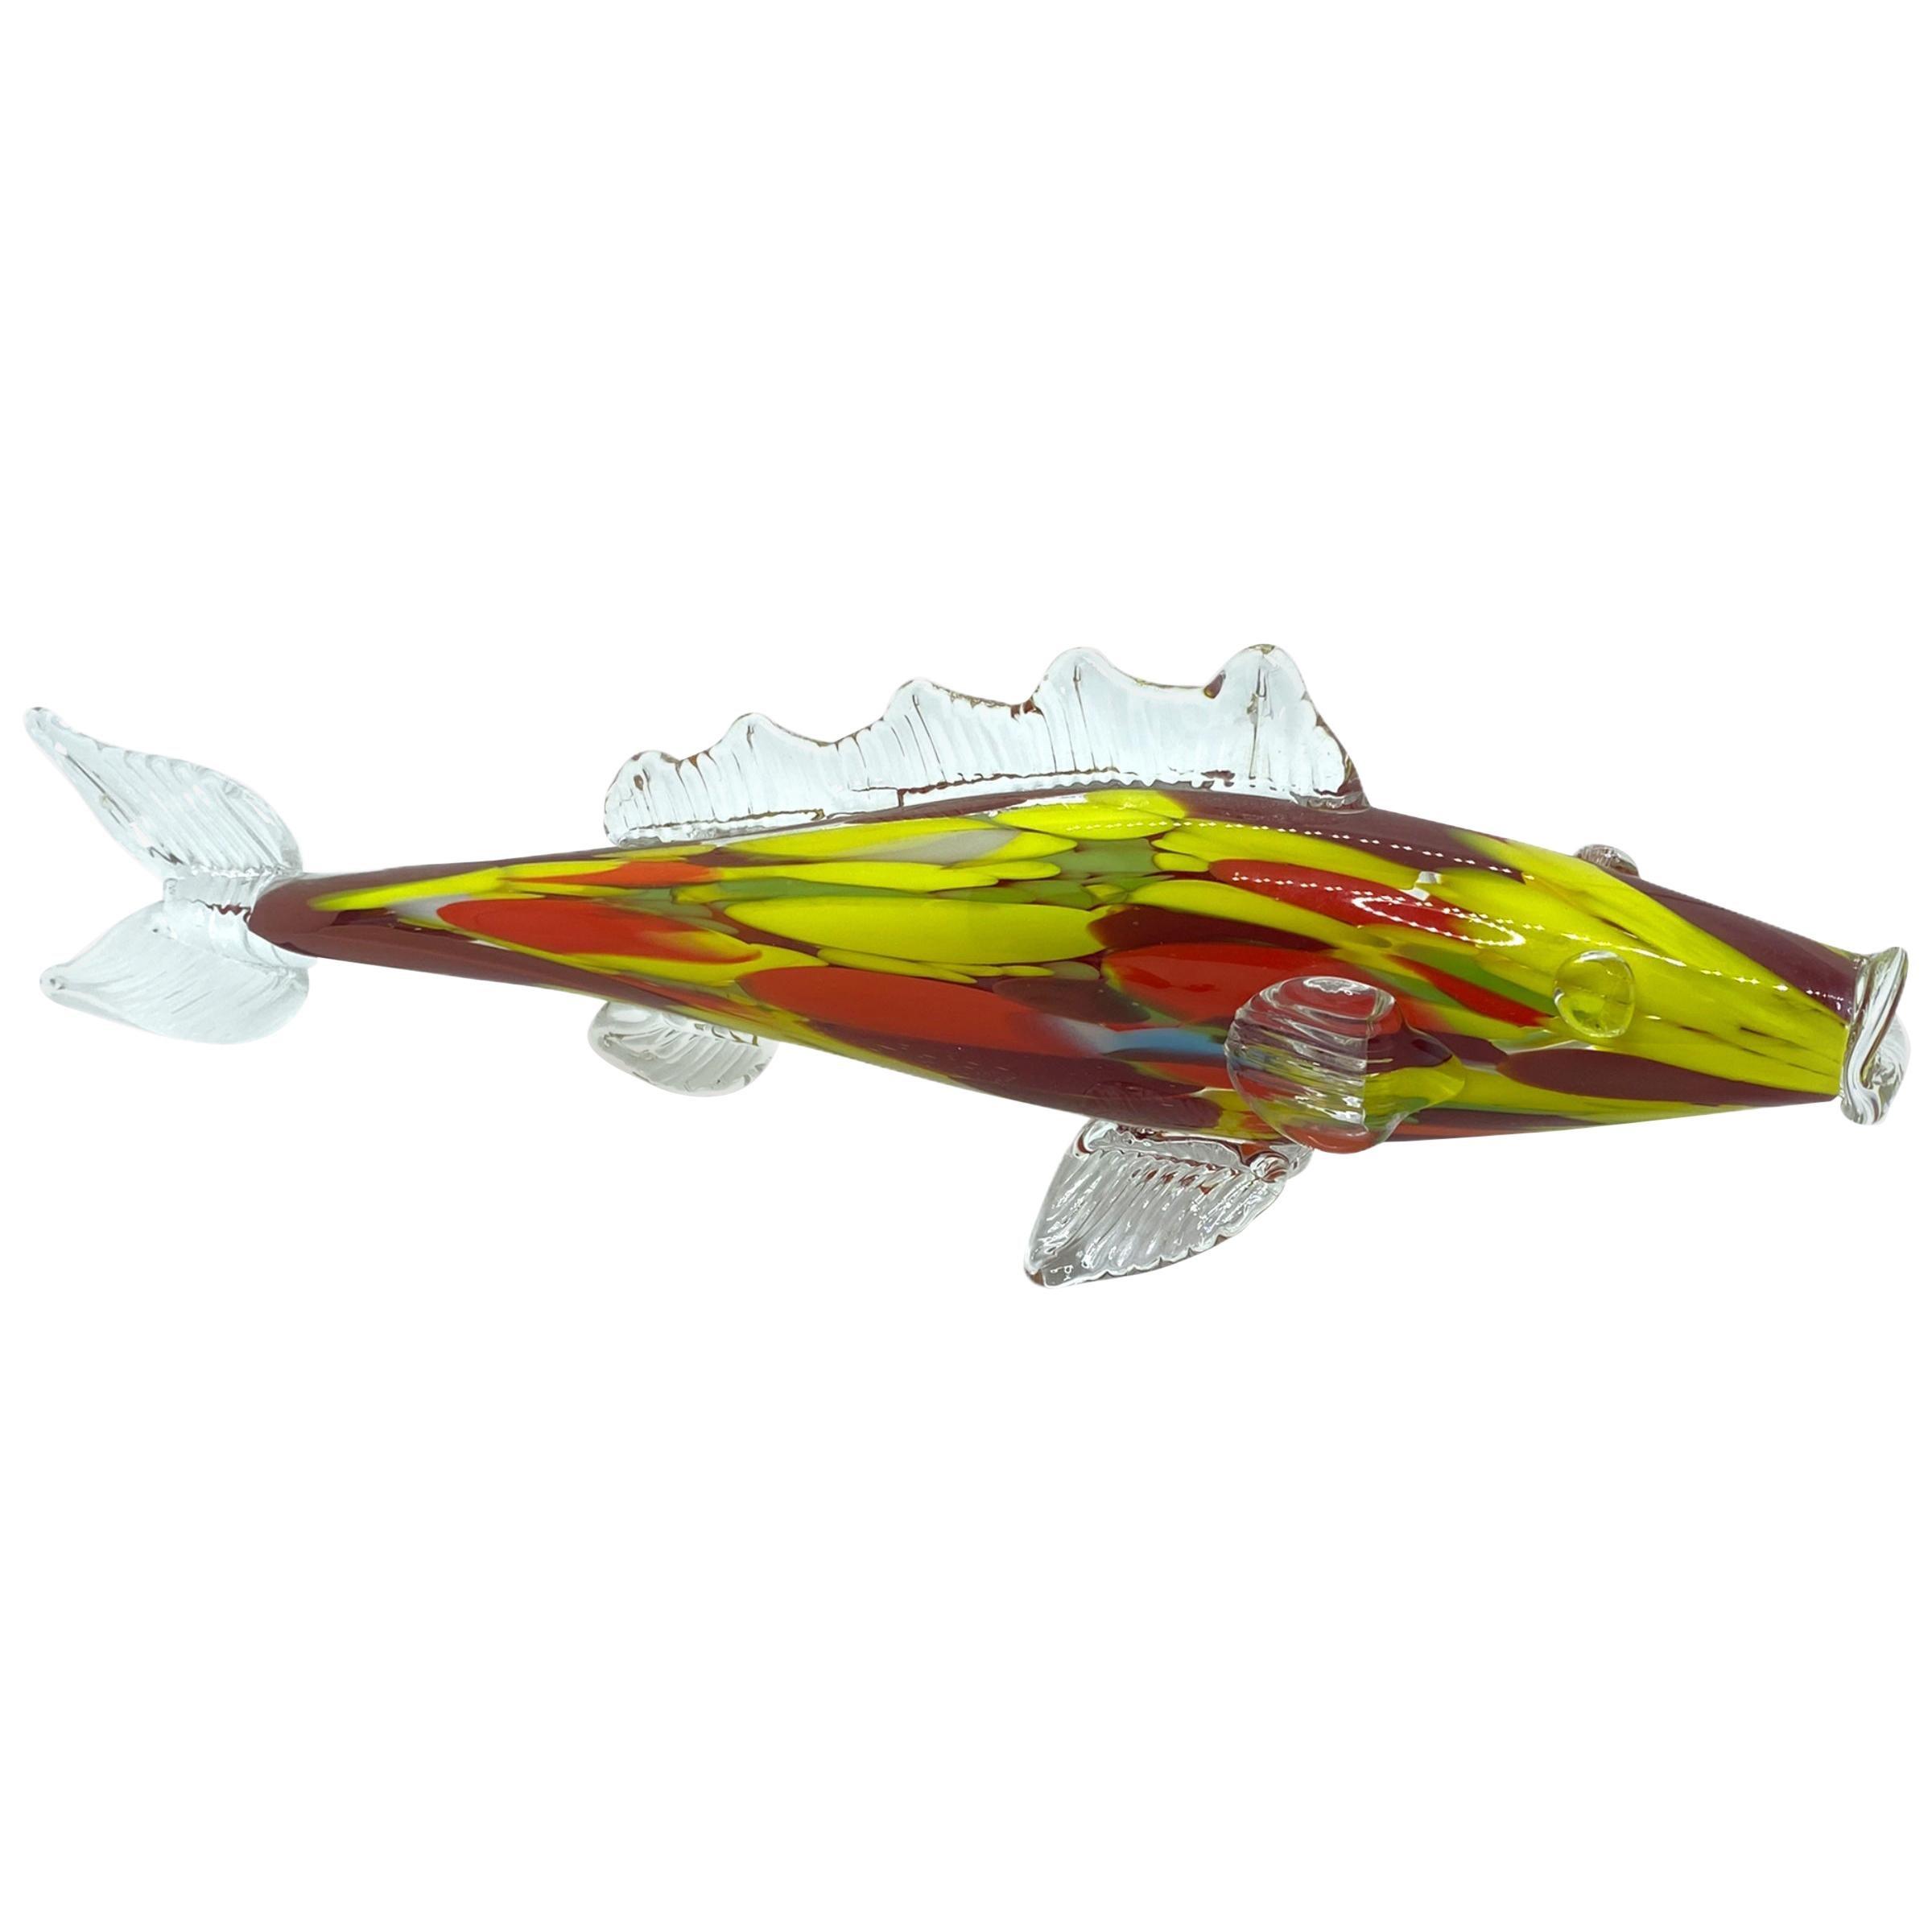 Beautiful Murano Italian Art Glass Trout Fish Sculpture, Italy, 1960s